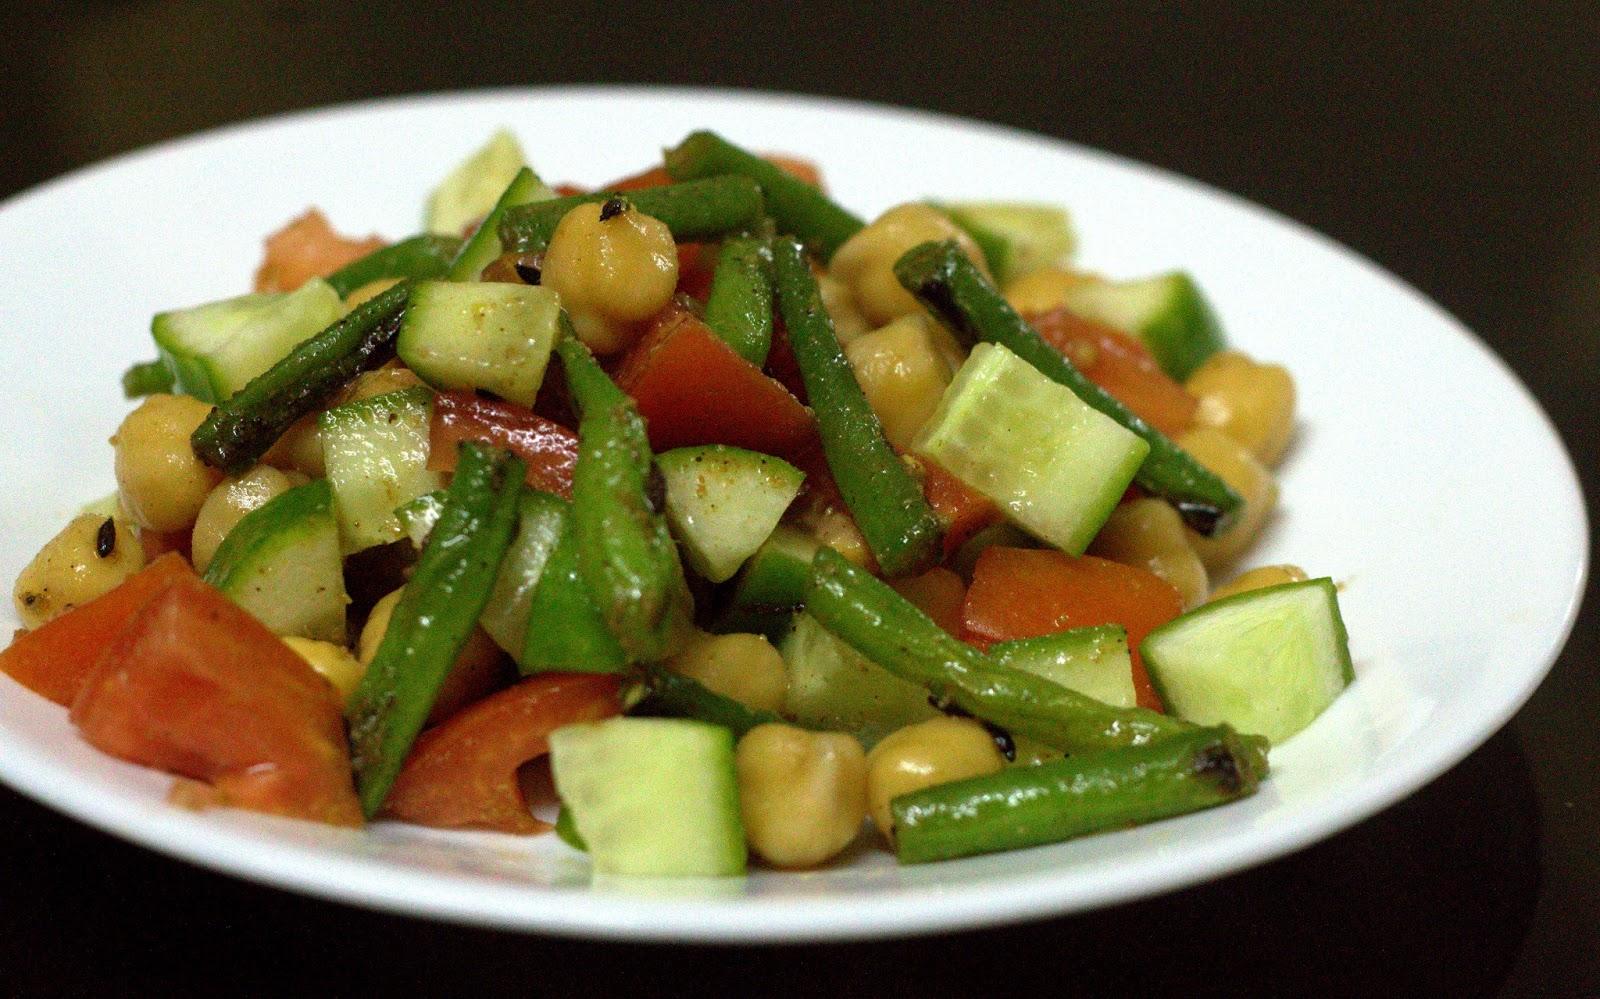 Haricot Vert Beans Haricot Verts Green Beans